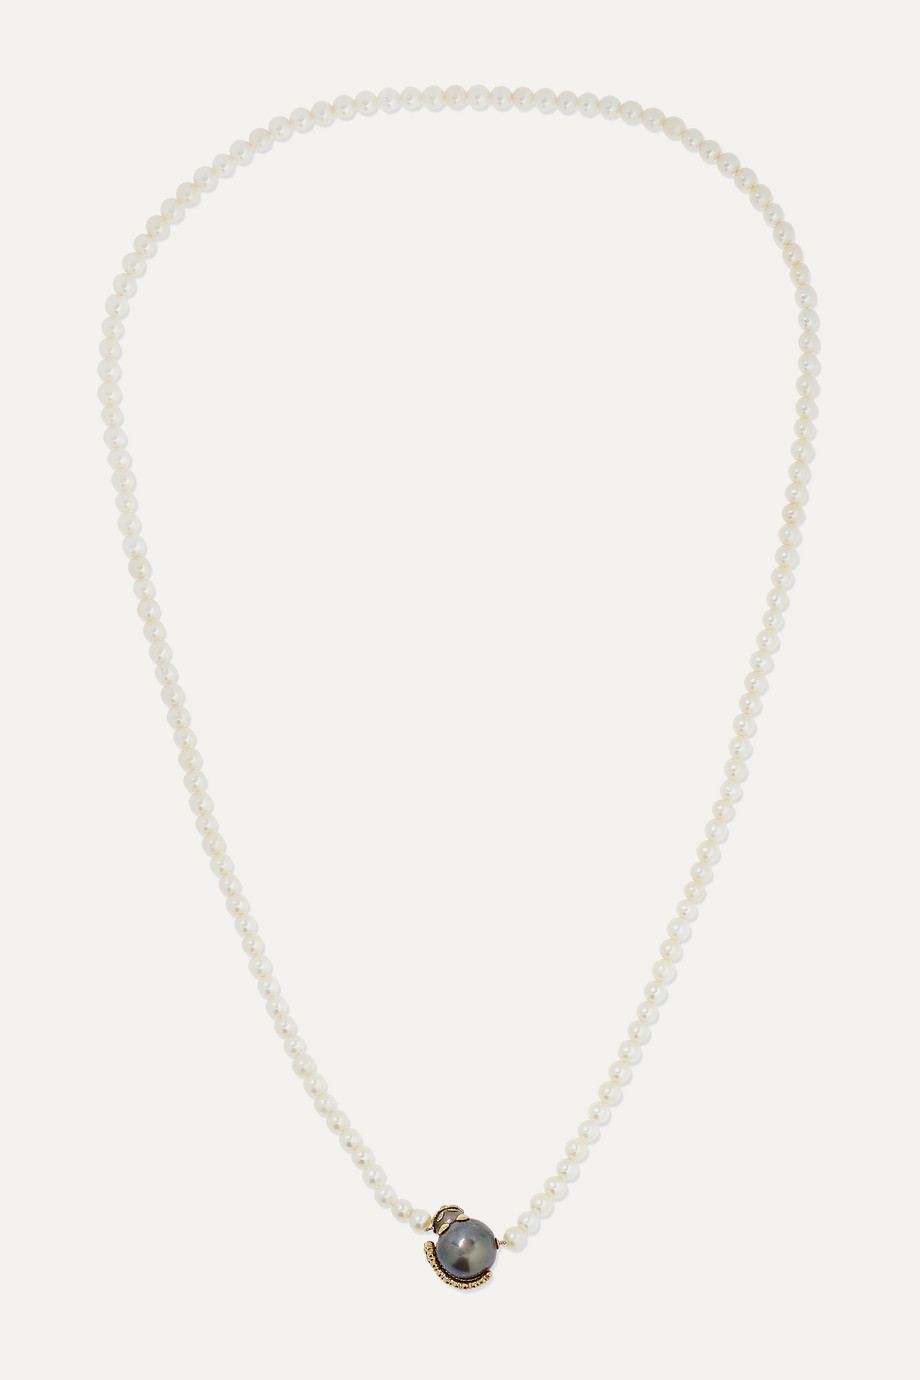 Yvonne Léon 18-karat gold, freshwater pearl and diamond necklace